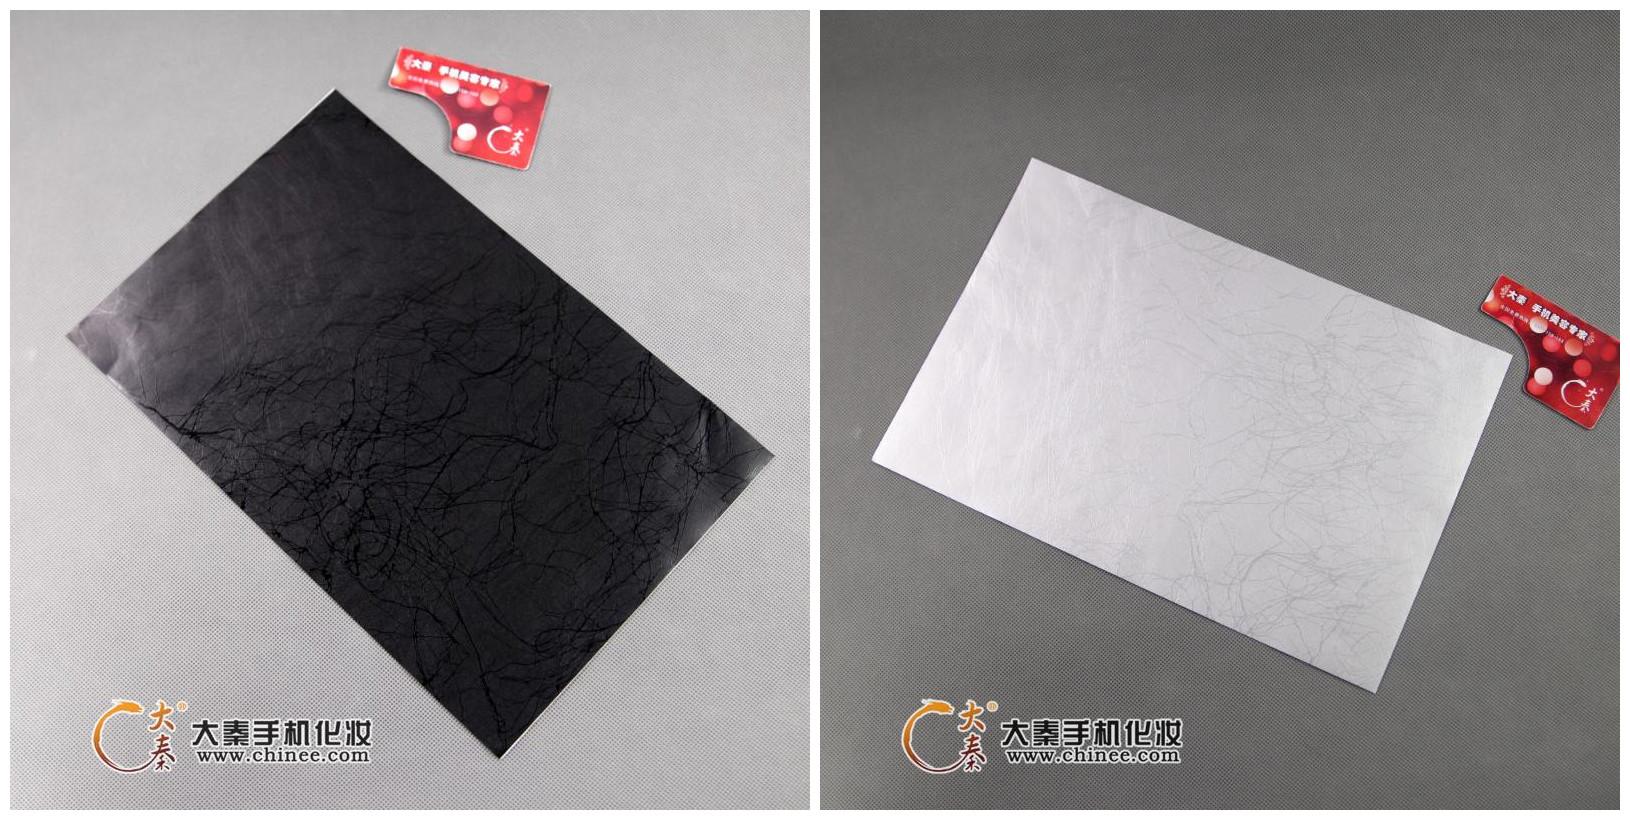 2lightning ink pattern leather films